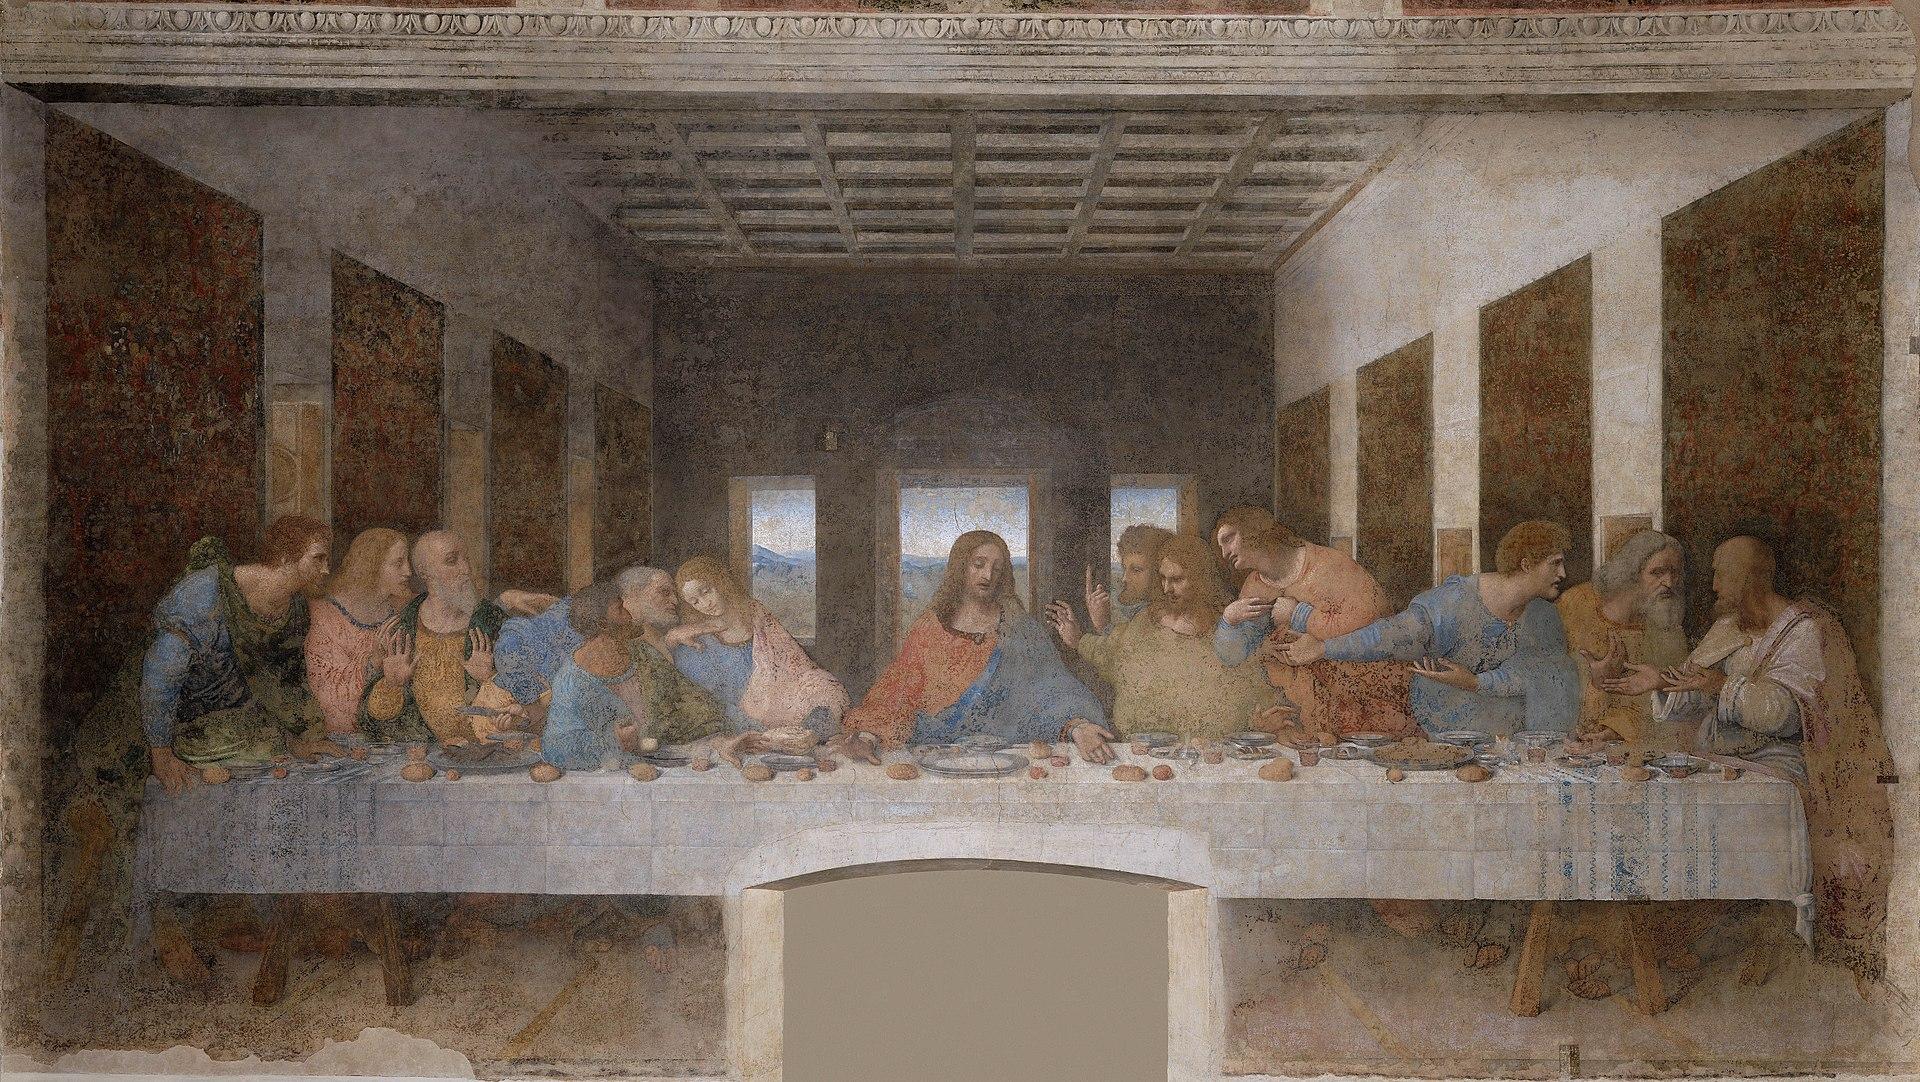 The Last Supper, da Vinci